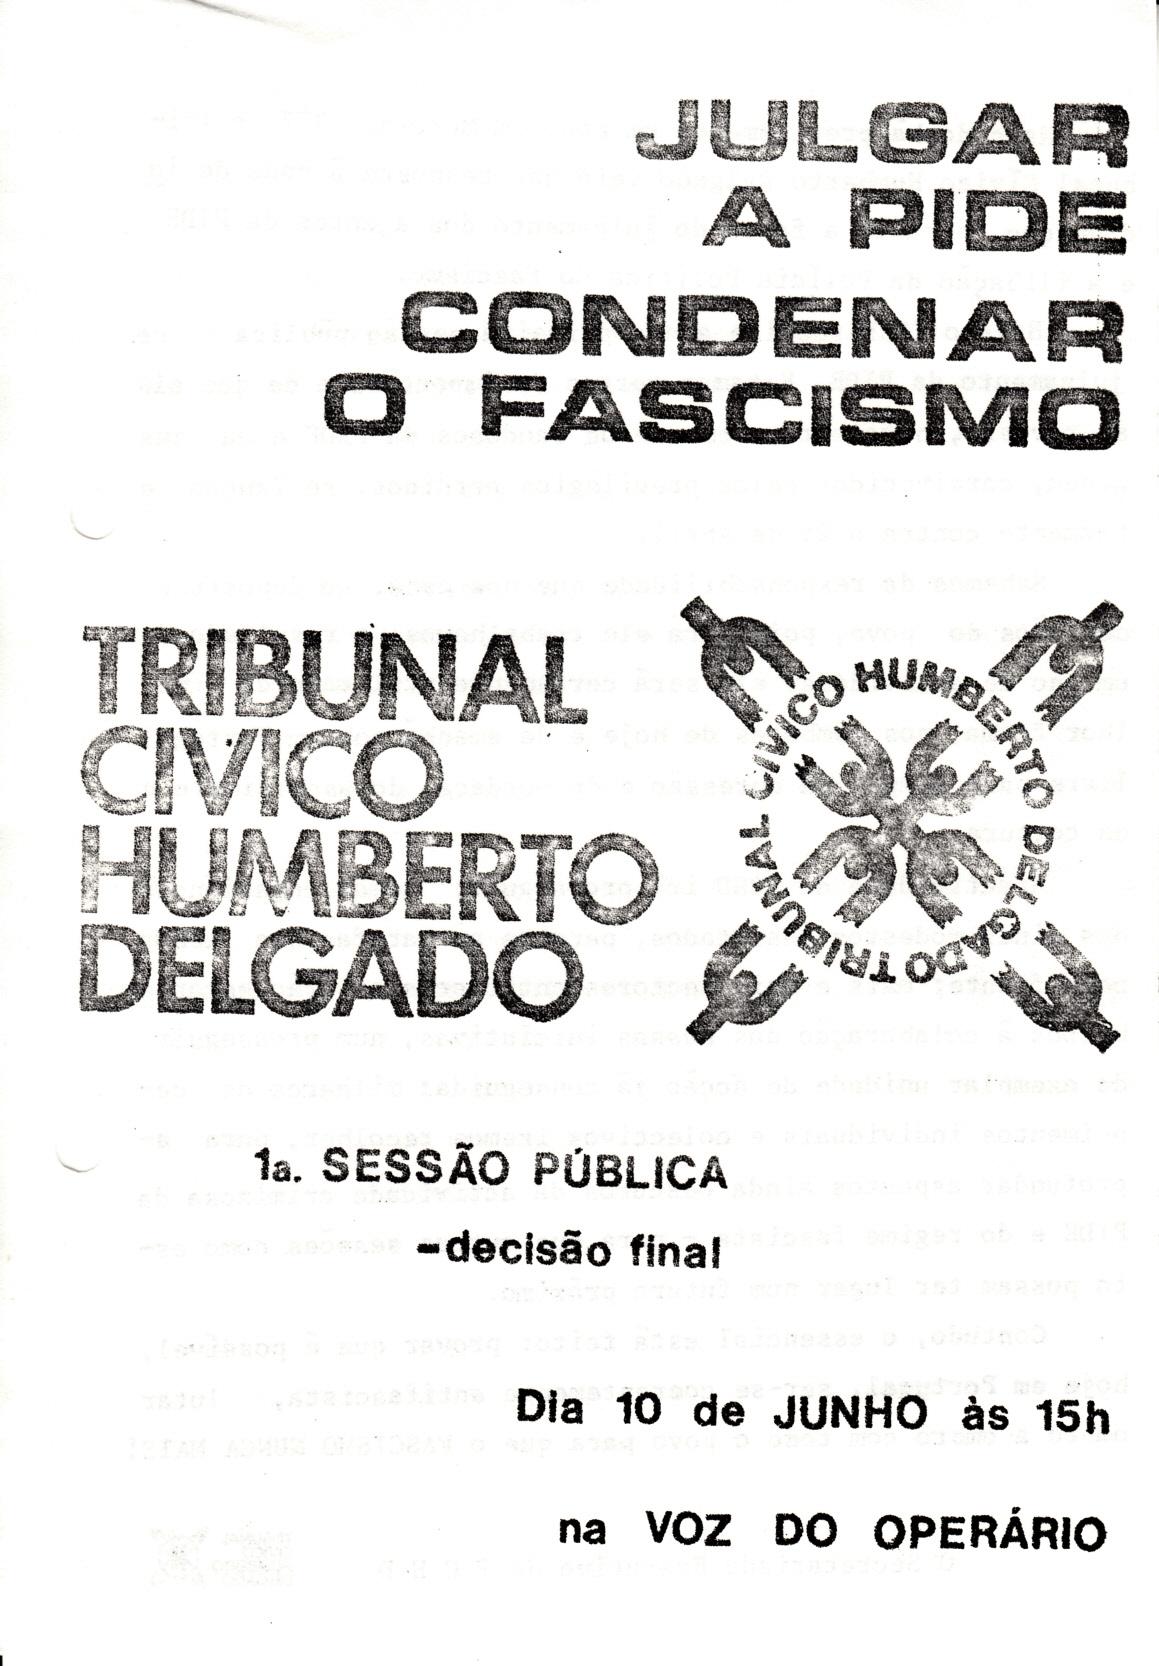 TCHD_0001